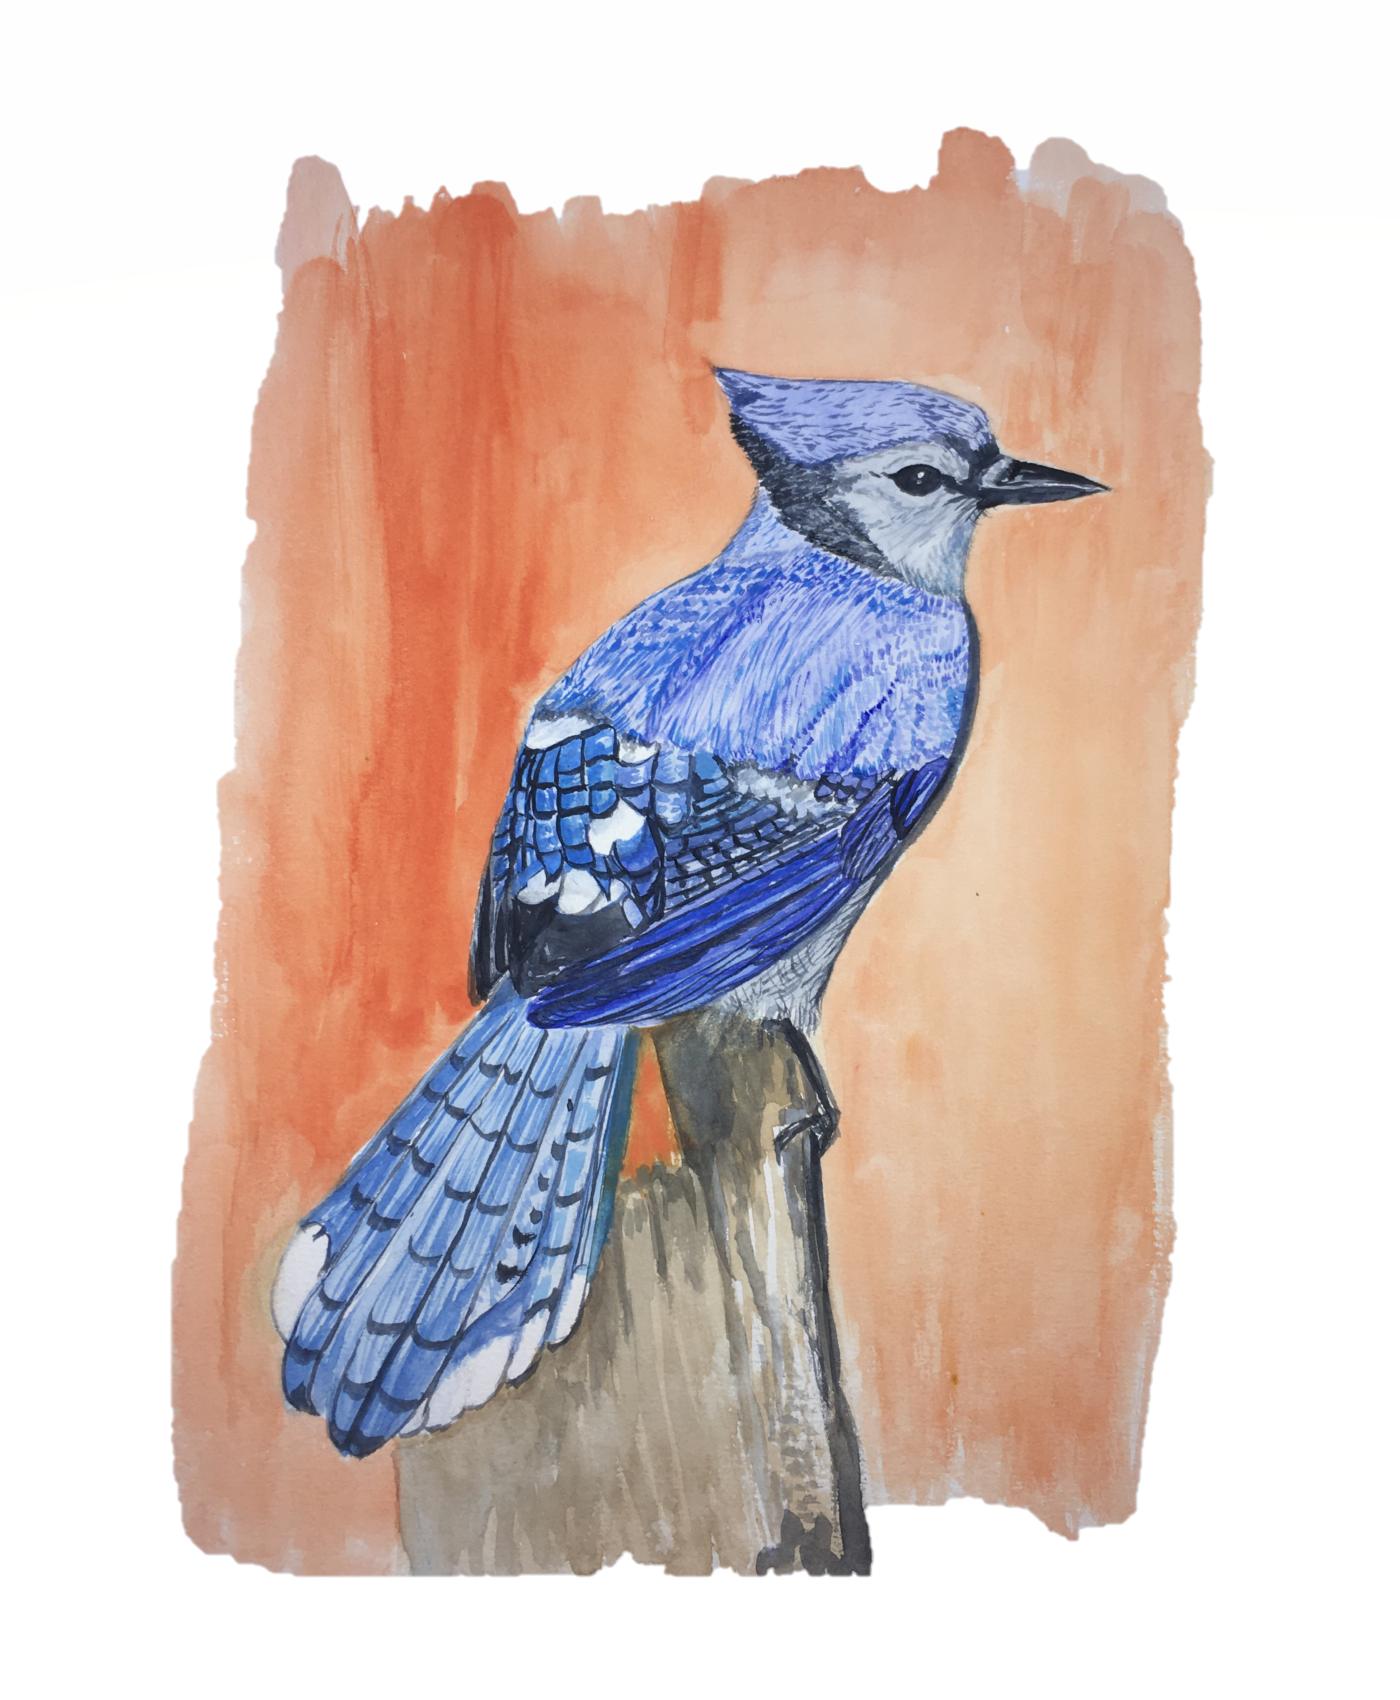 #watercolor #birdillustration #watercolorillustration #bluejay